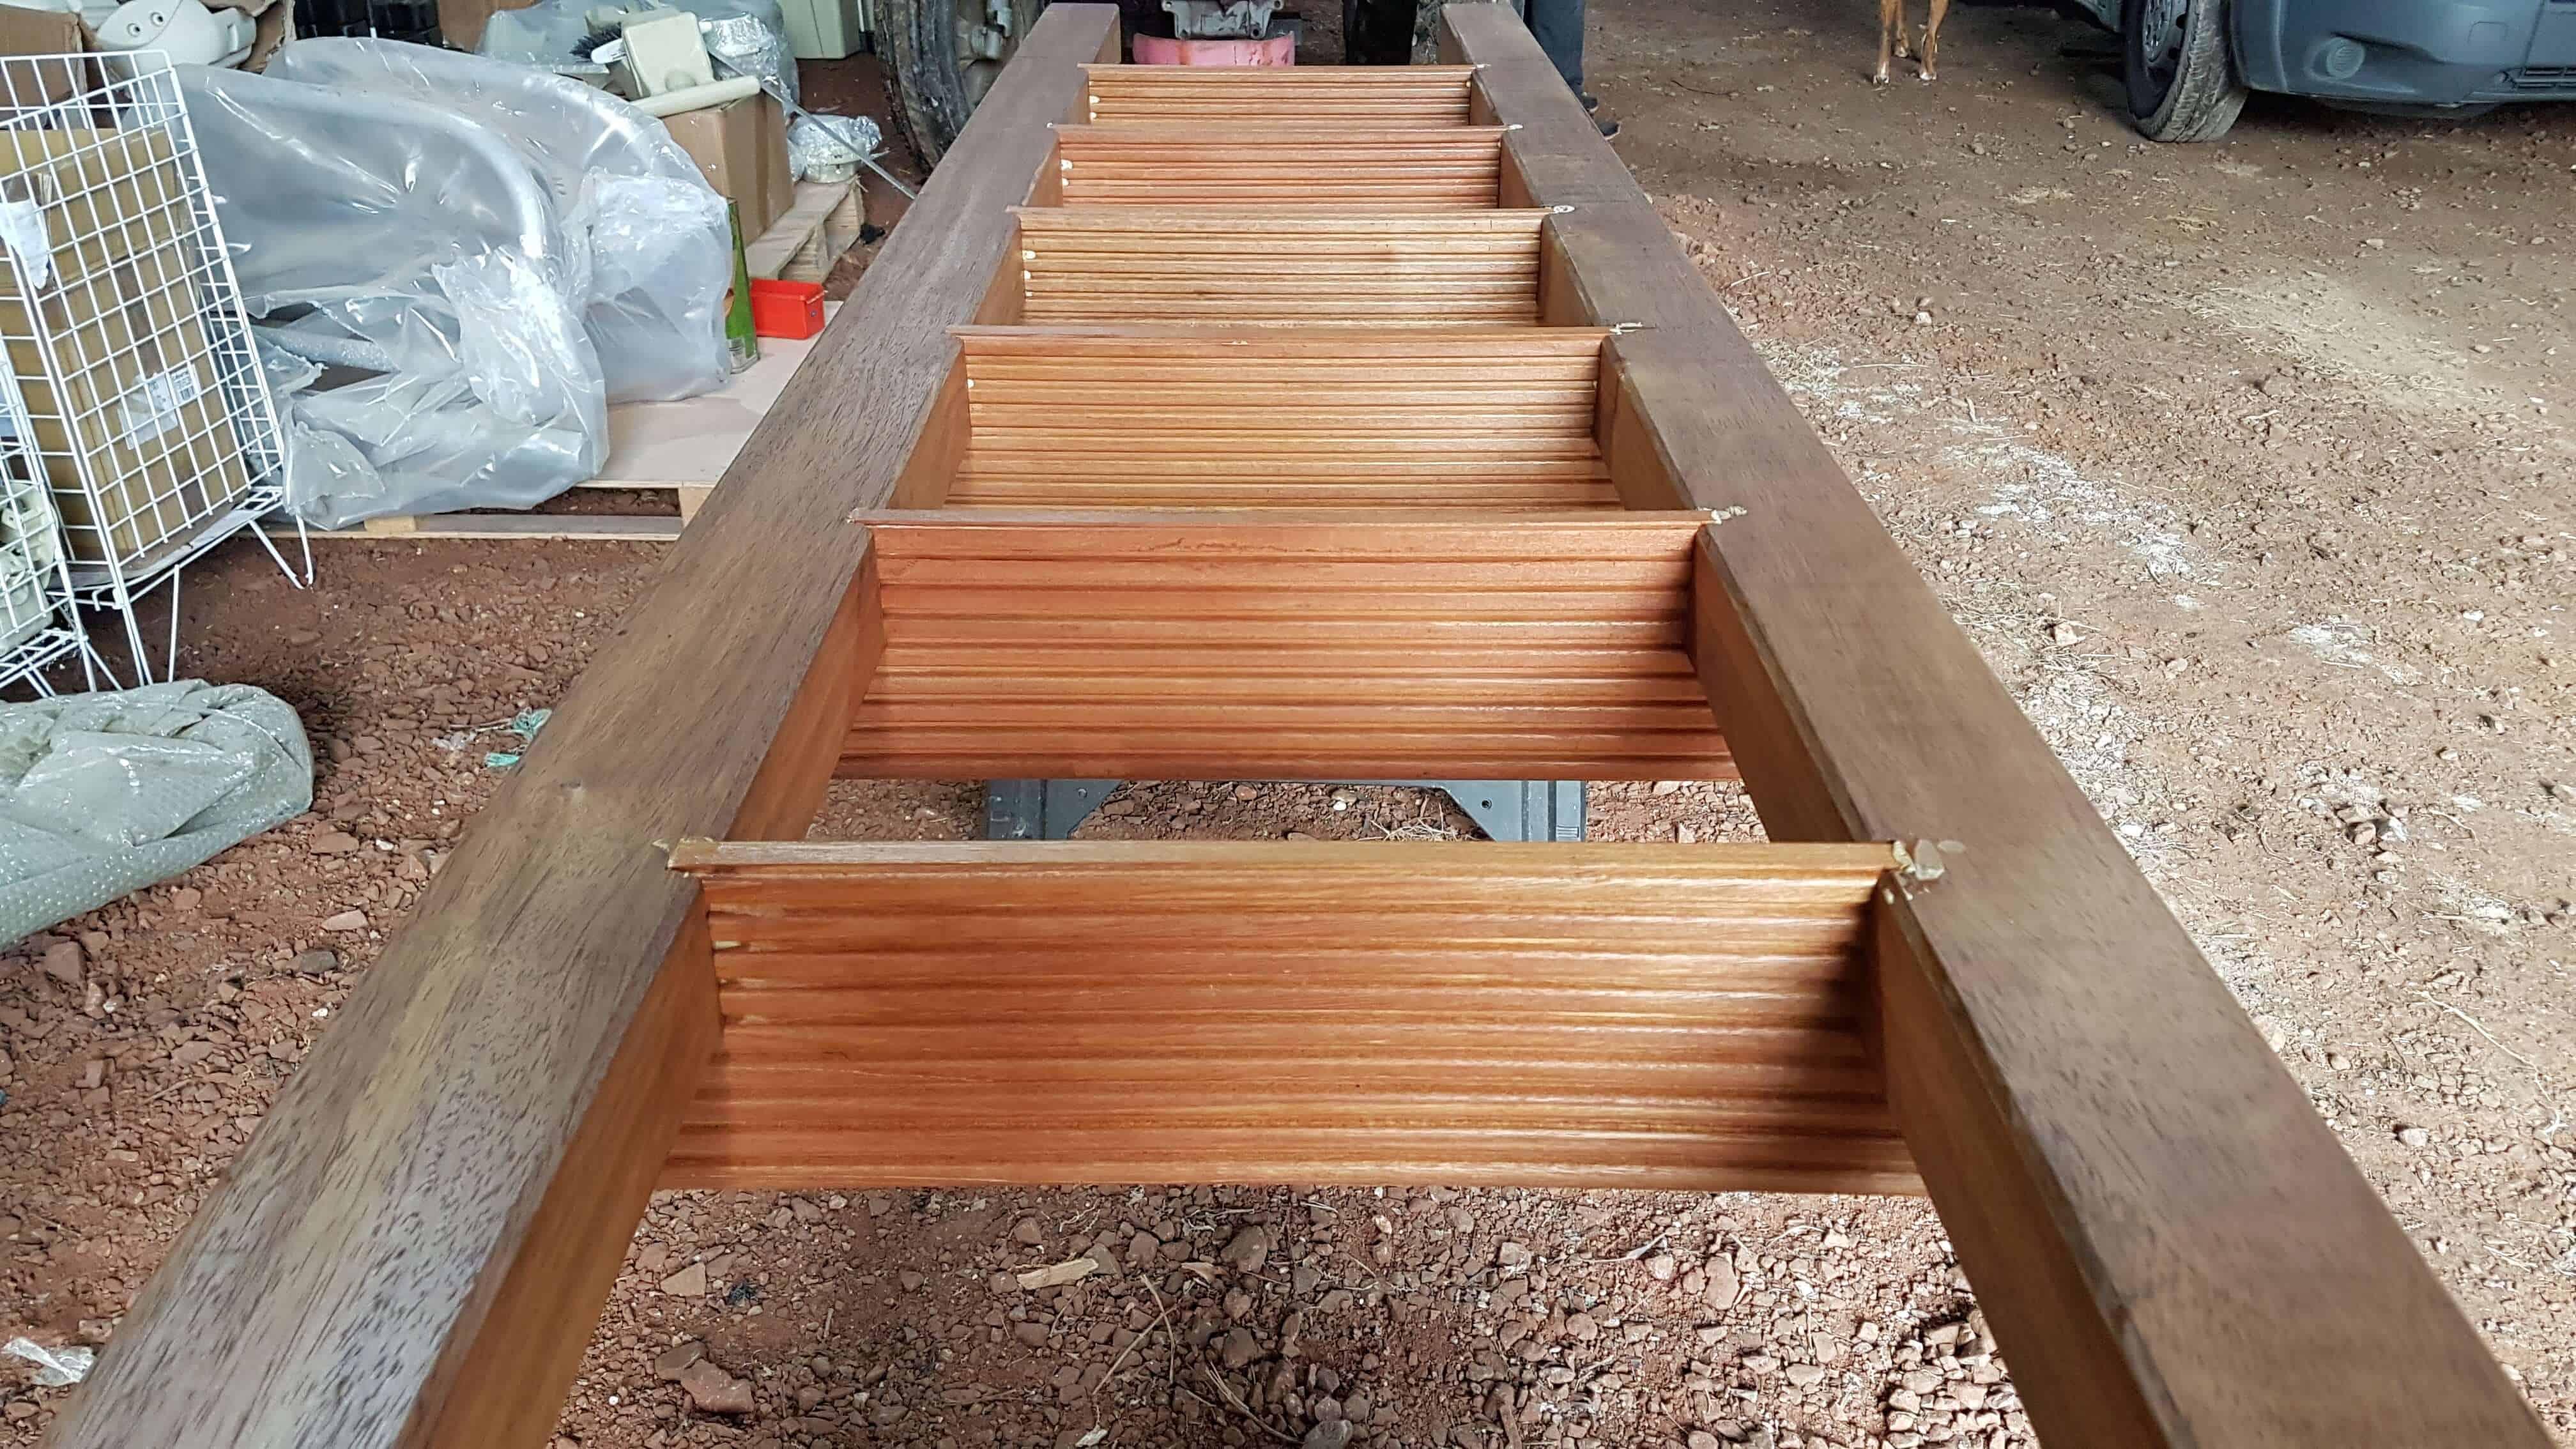 bespoke wooden ladder for rotodock decked pontoon